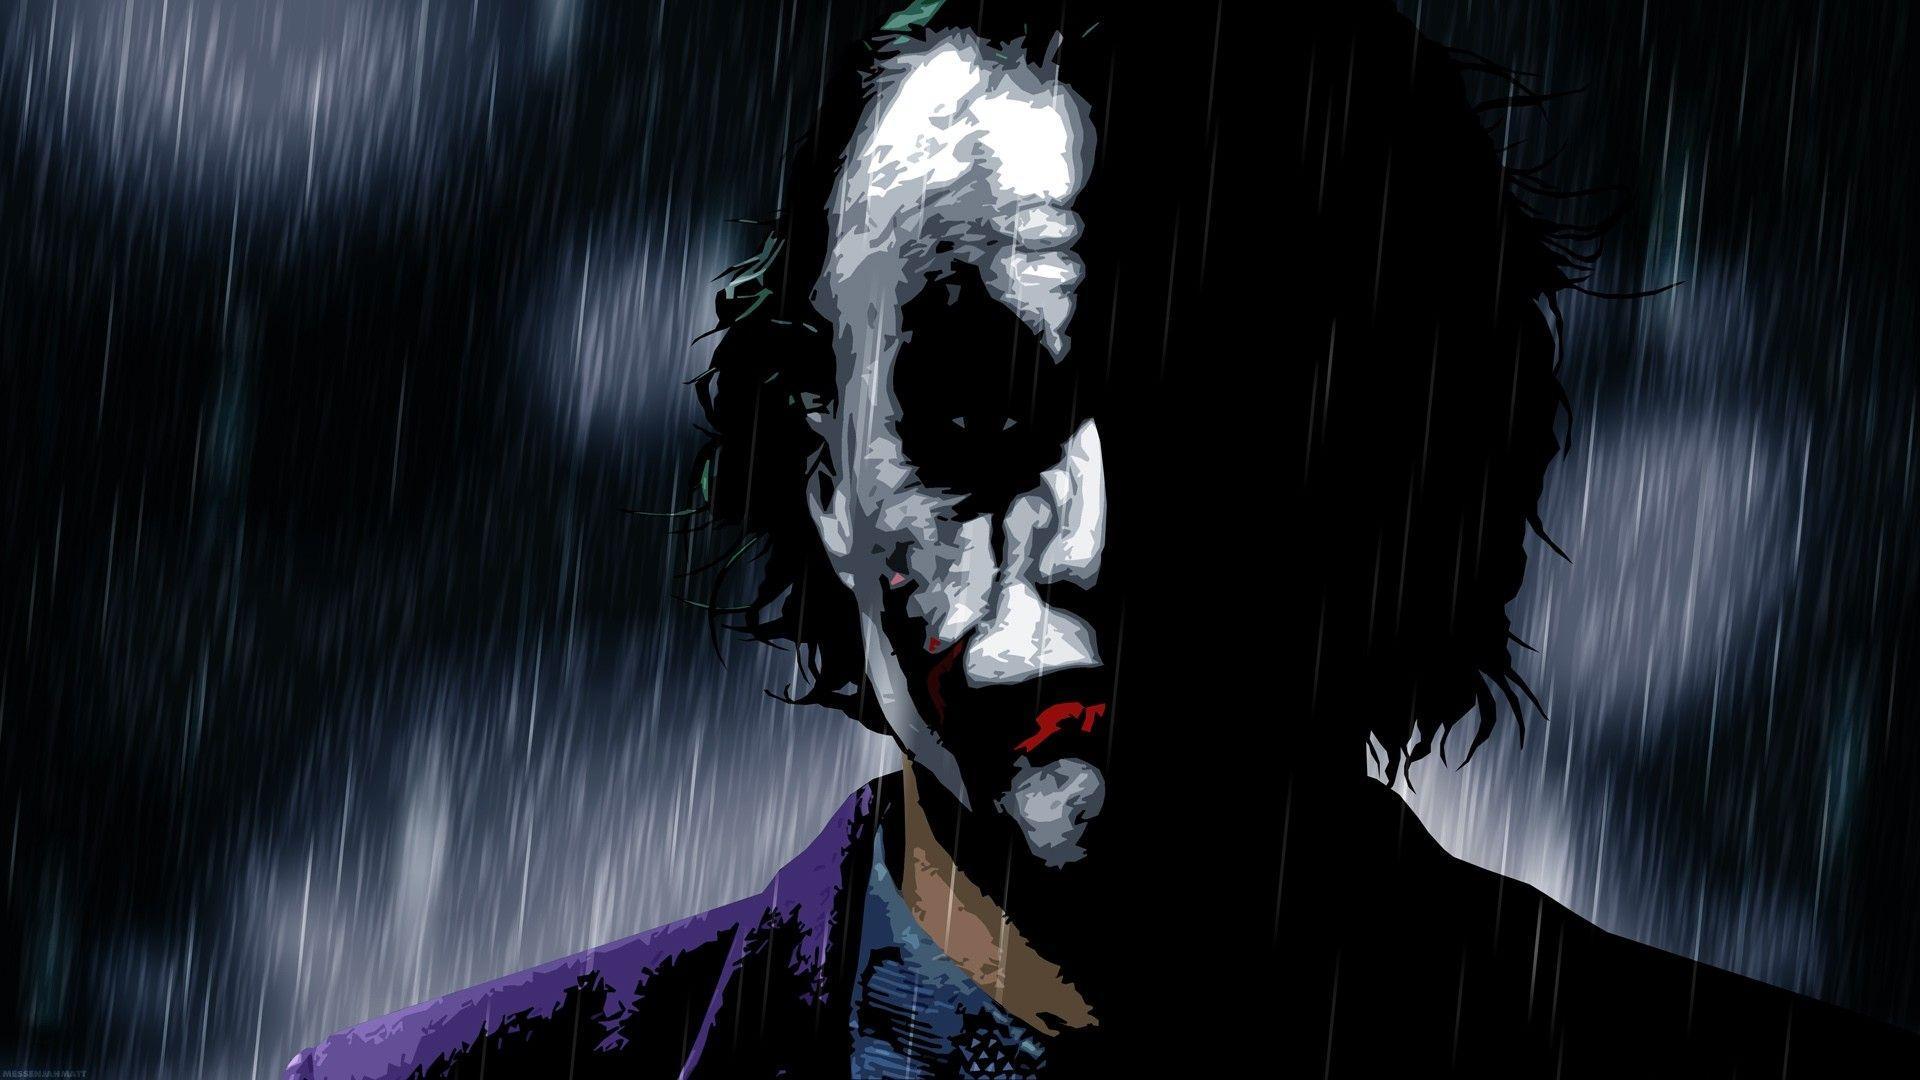 Joker Hd Wallpapers 1080p For Desktop